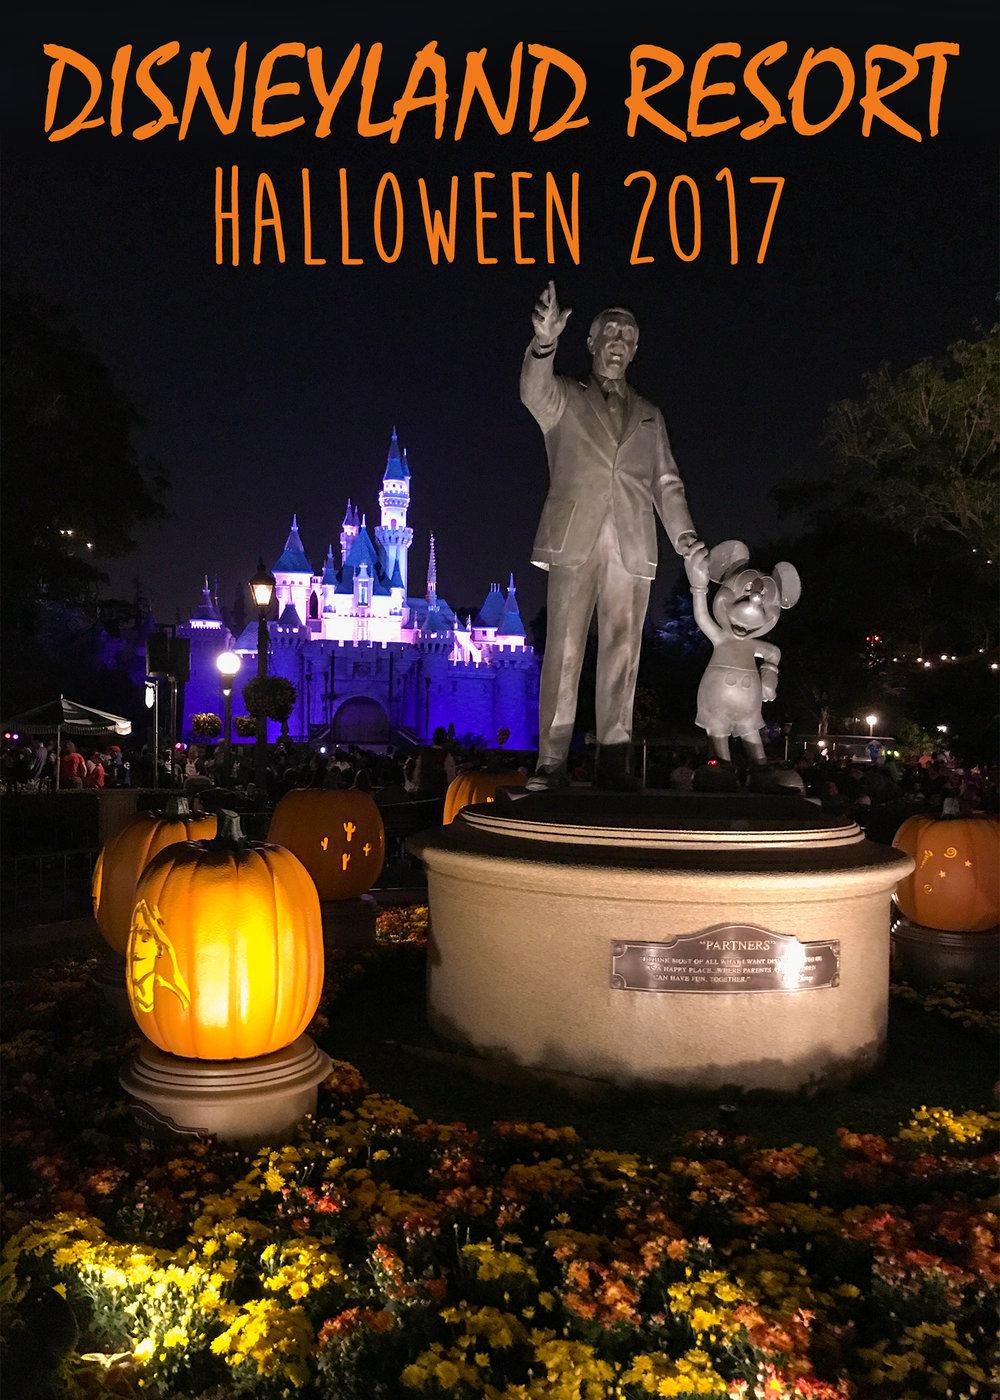 Disneyland_Resort_Halloween_Decorations_2017.jpg